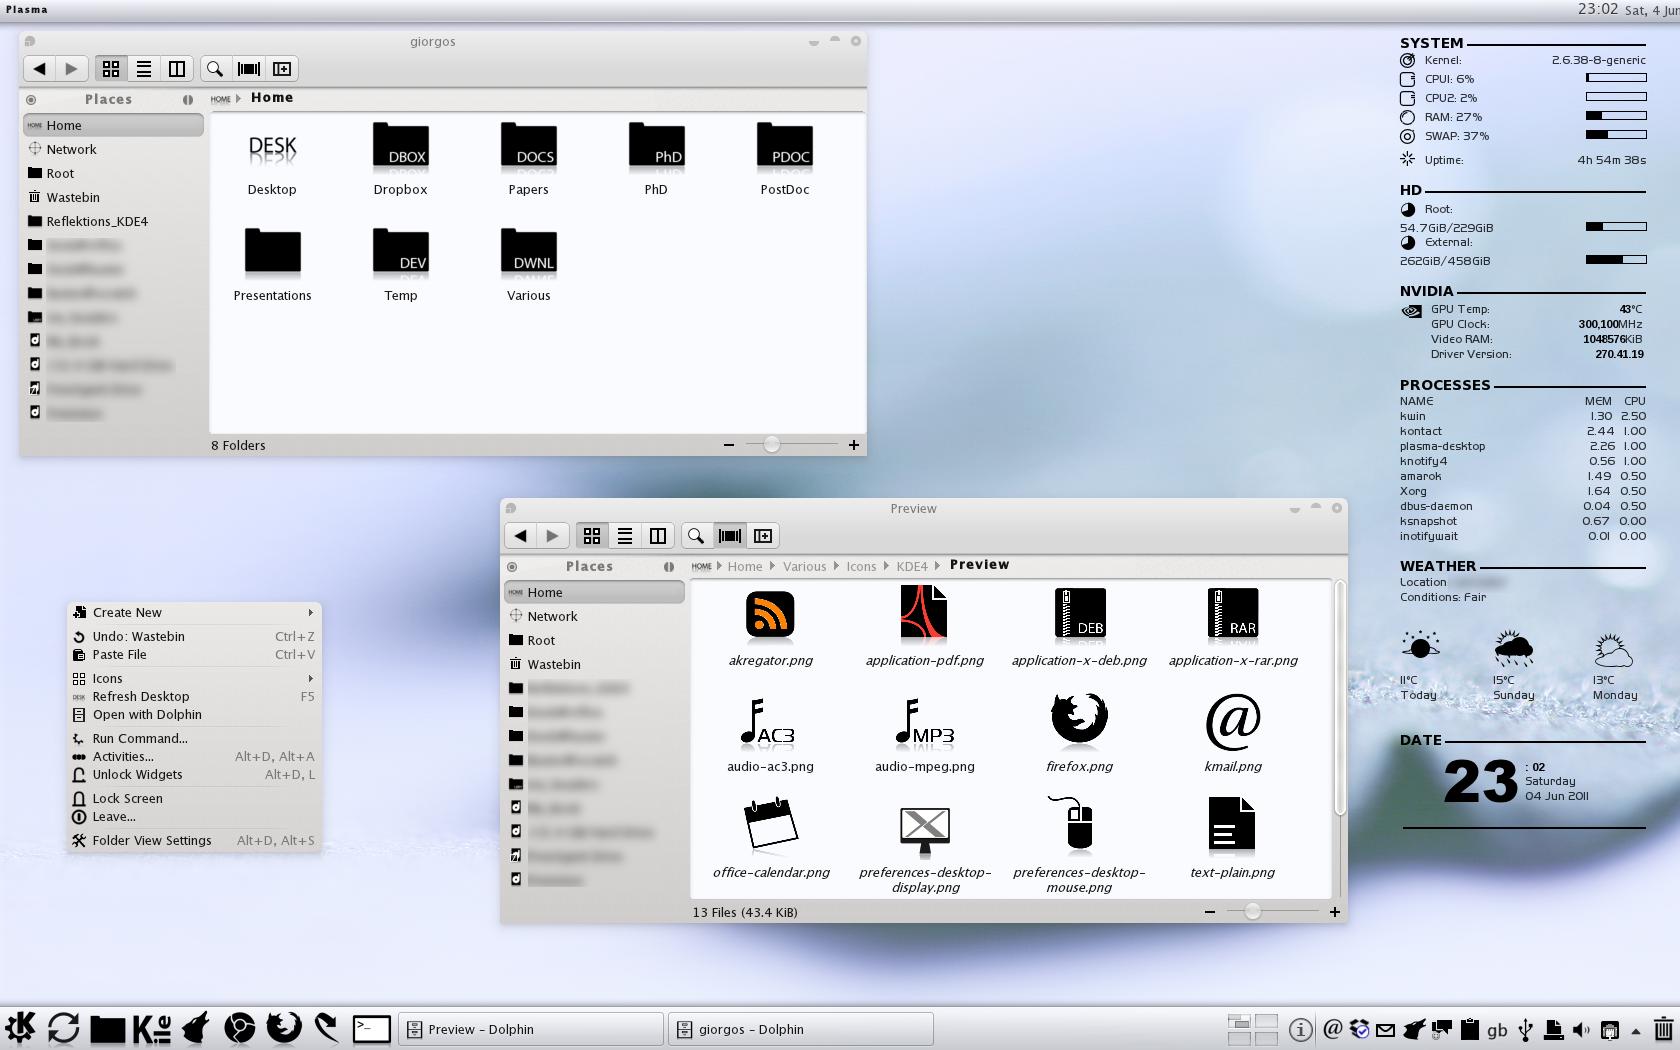 Reflektions_KDE4 v1.57